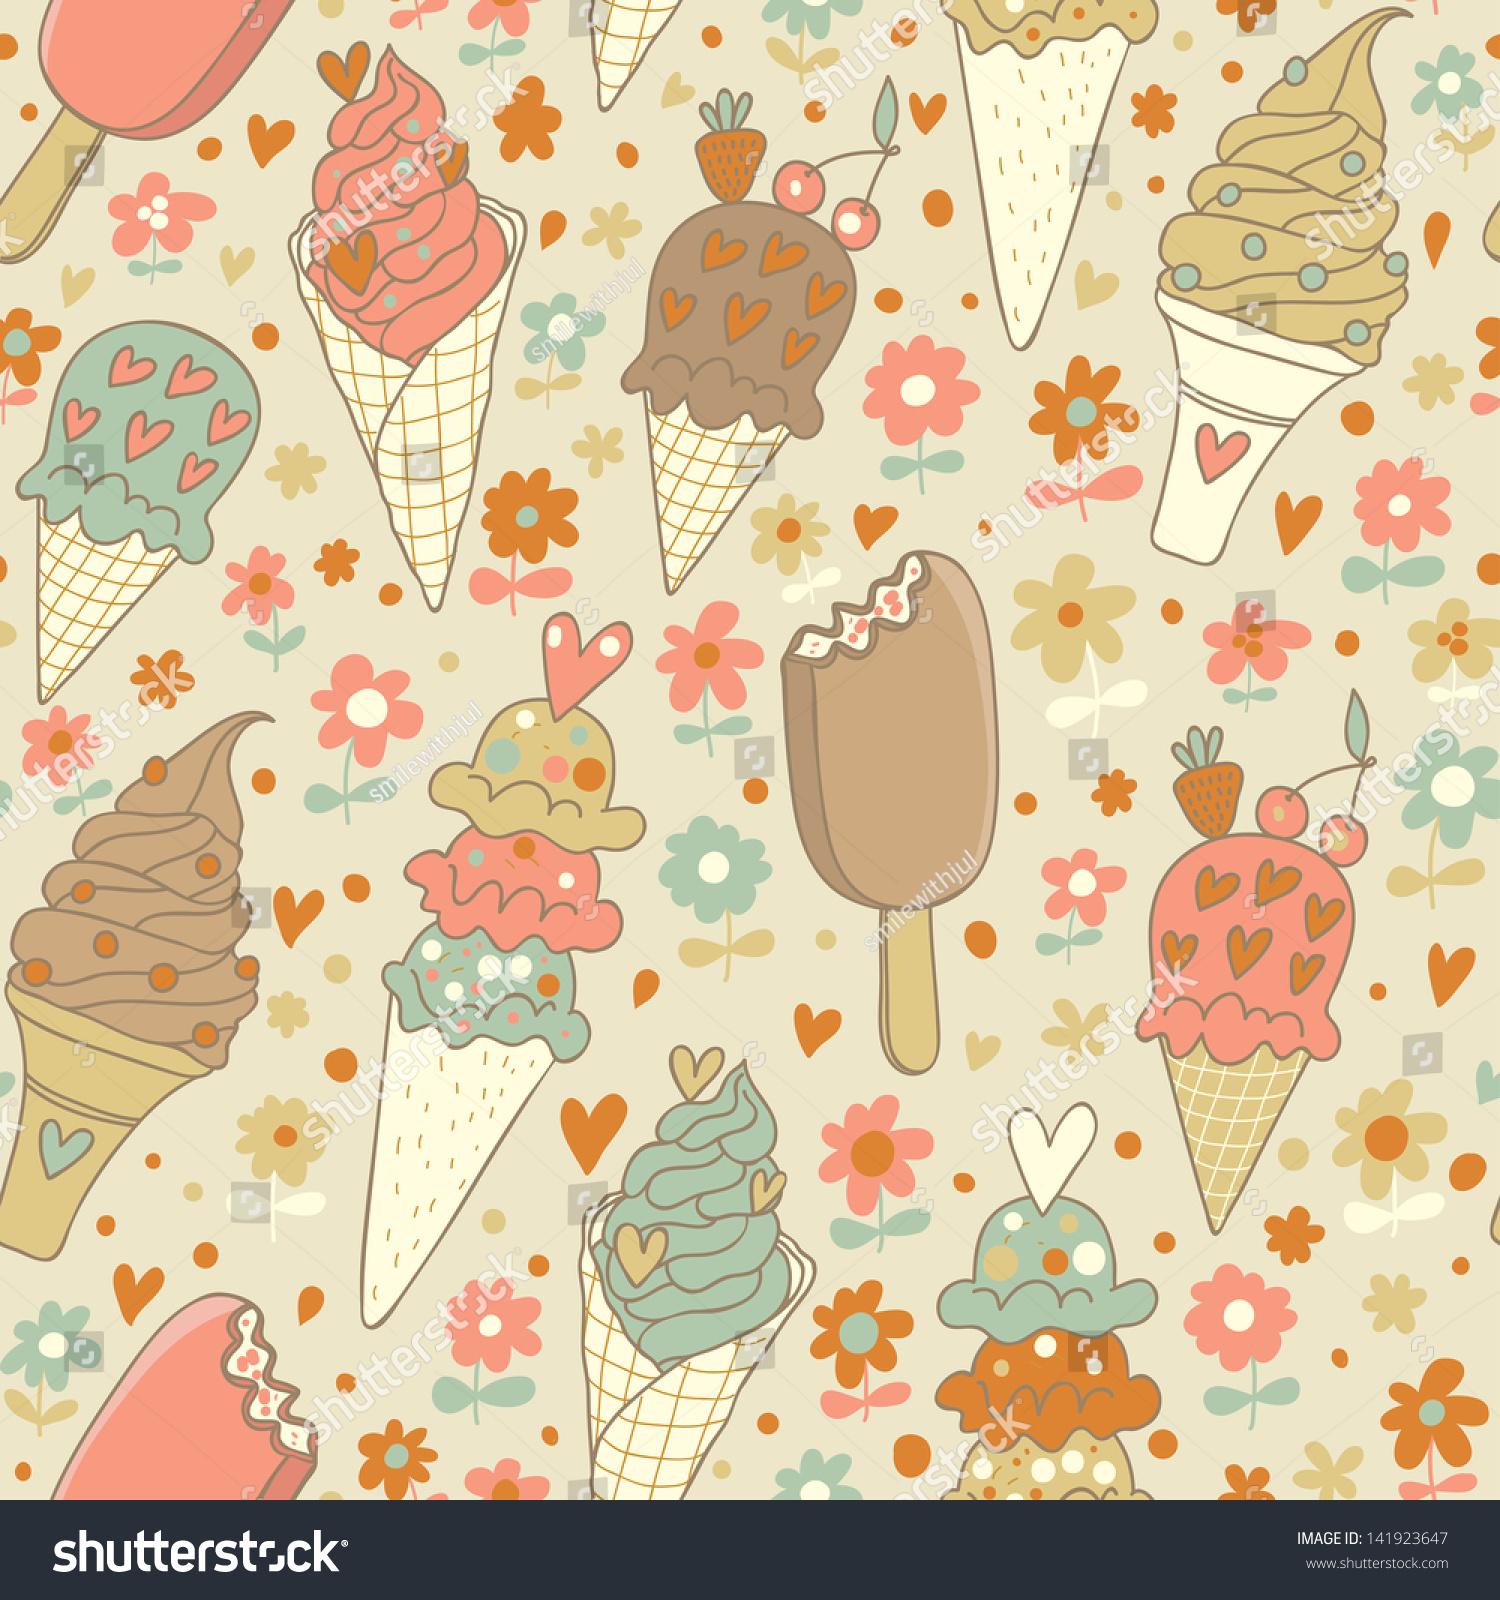 Seamless Ice Cream Background Vintage Style: Cute Vintage Summer Seamless Pattern Tasty Stock Vector